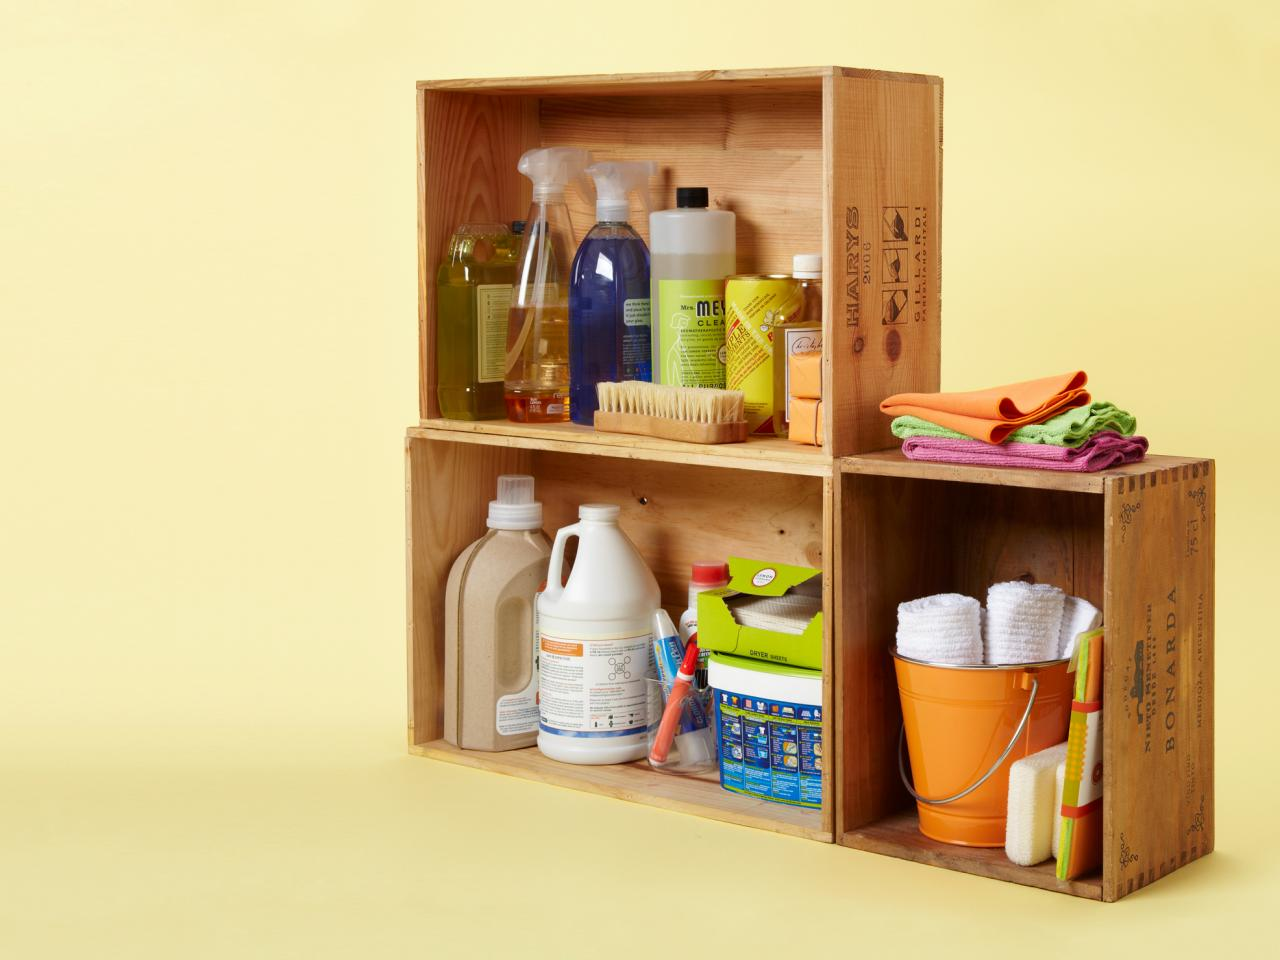 Small Coat Closet Organization Ideas Part - 32: HGTV.com